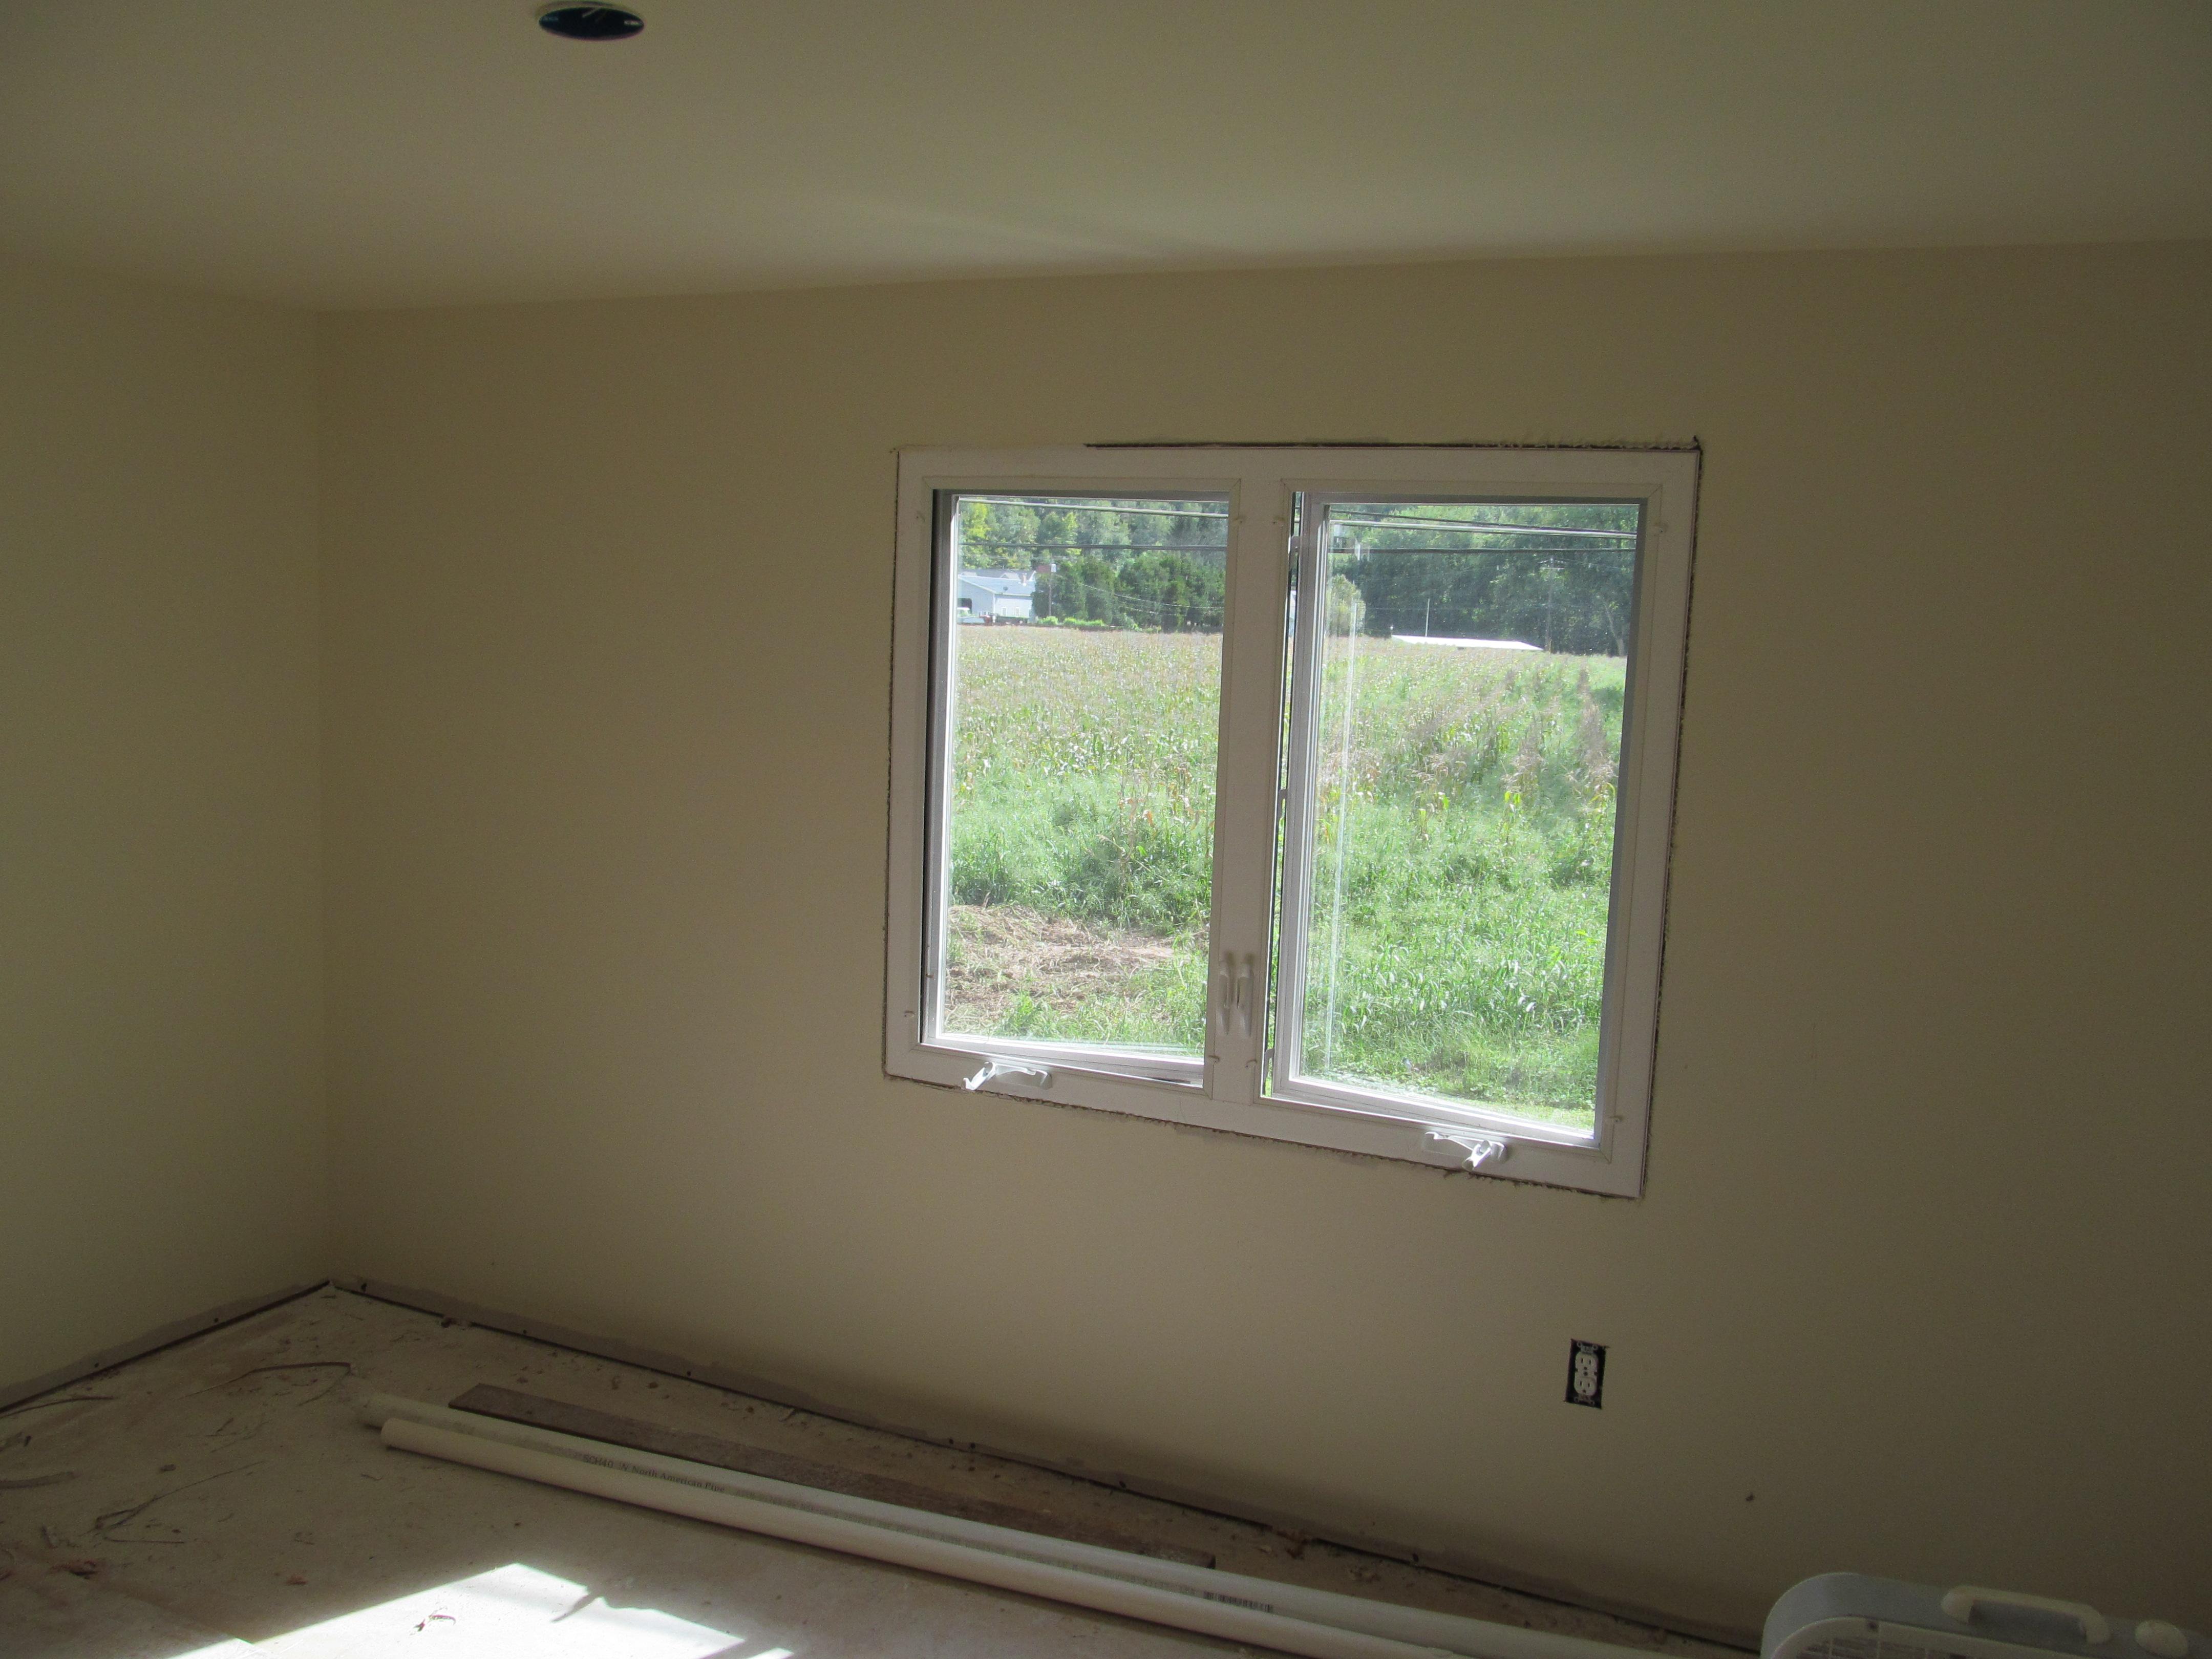 mobile home improvement interior room windows